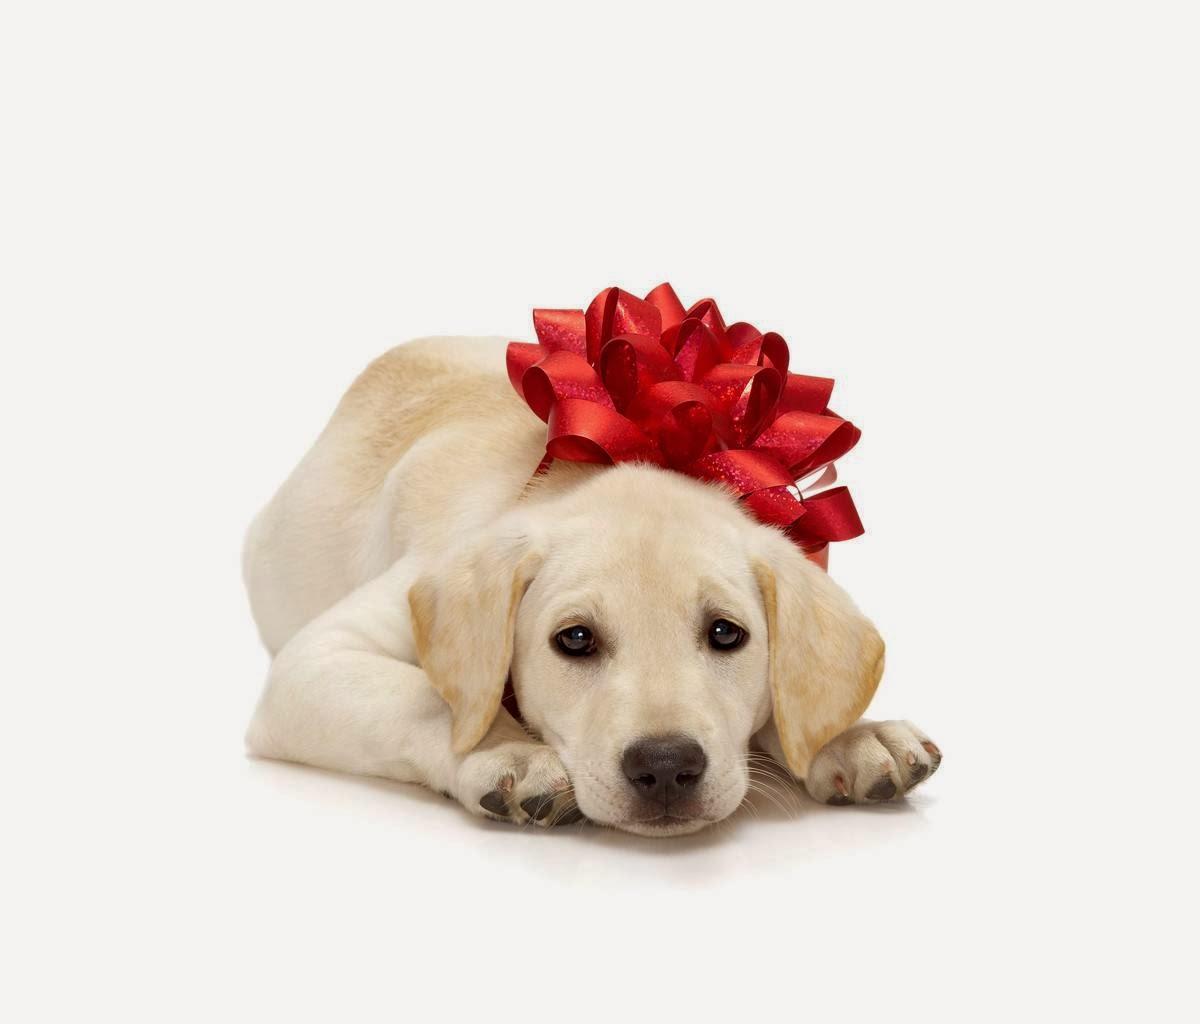 Christmas gift for dog lovers wallpaper   beautiful desktop wallpapers 1200x1024